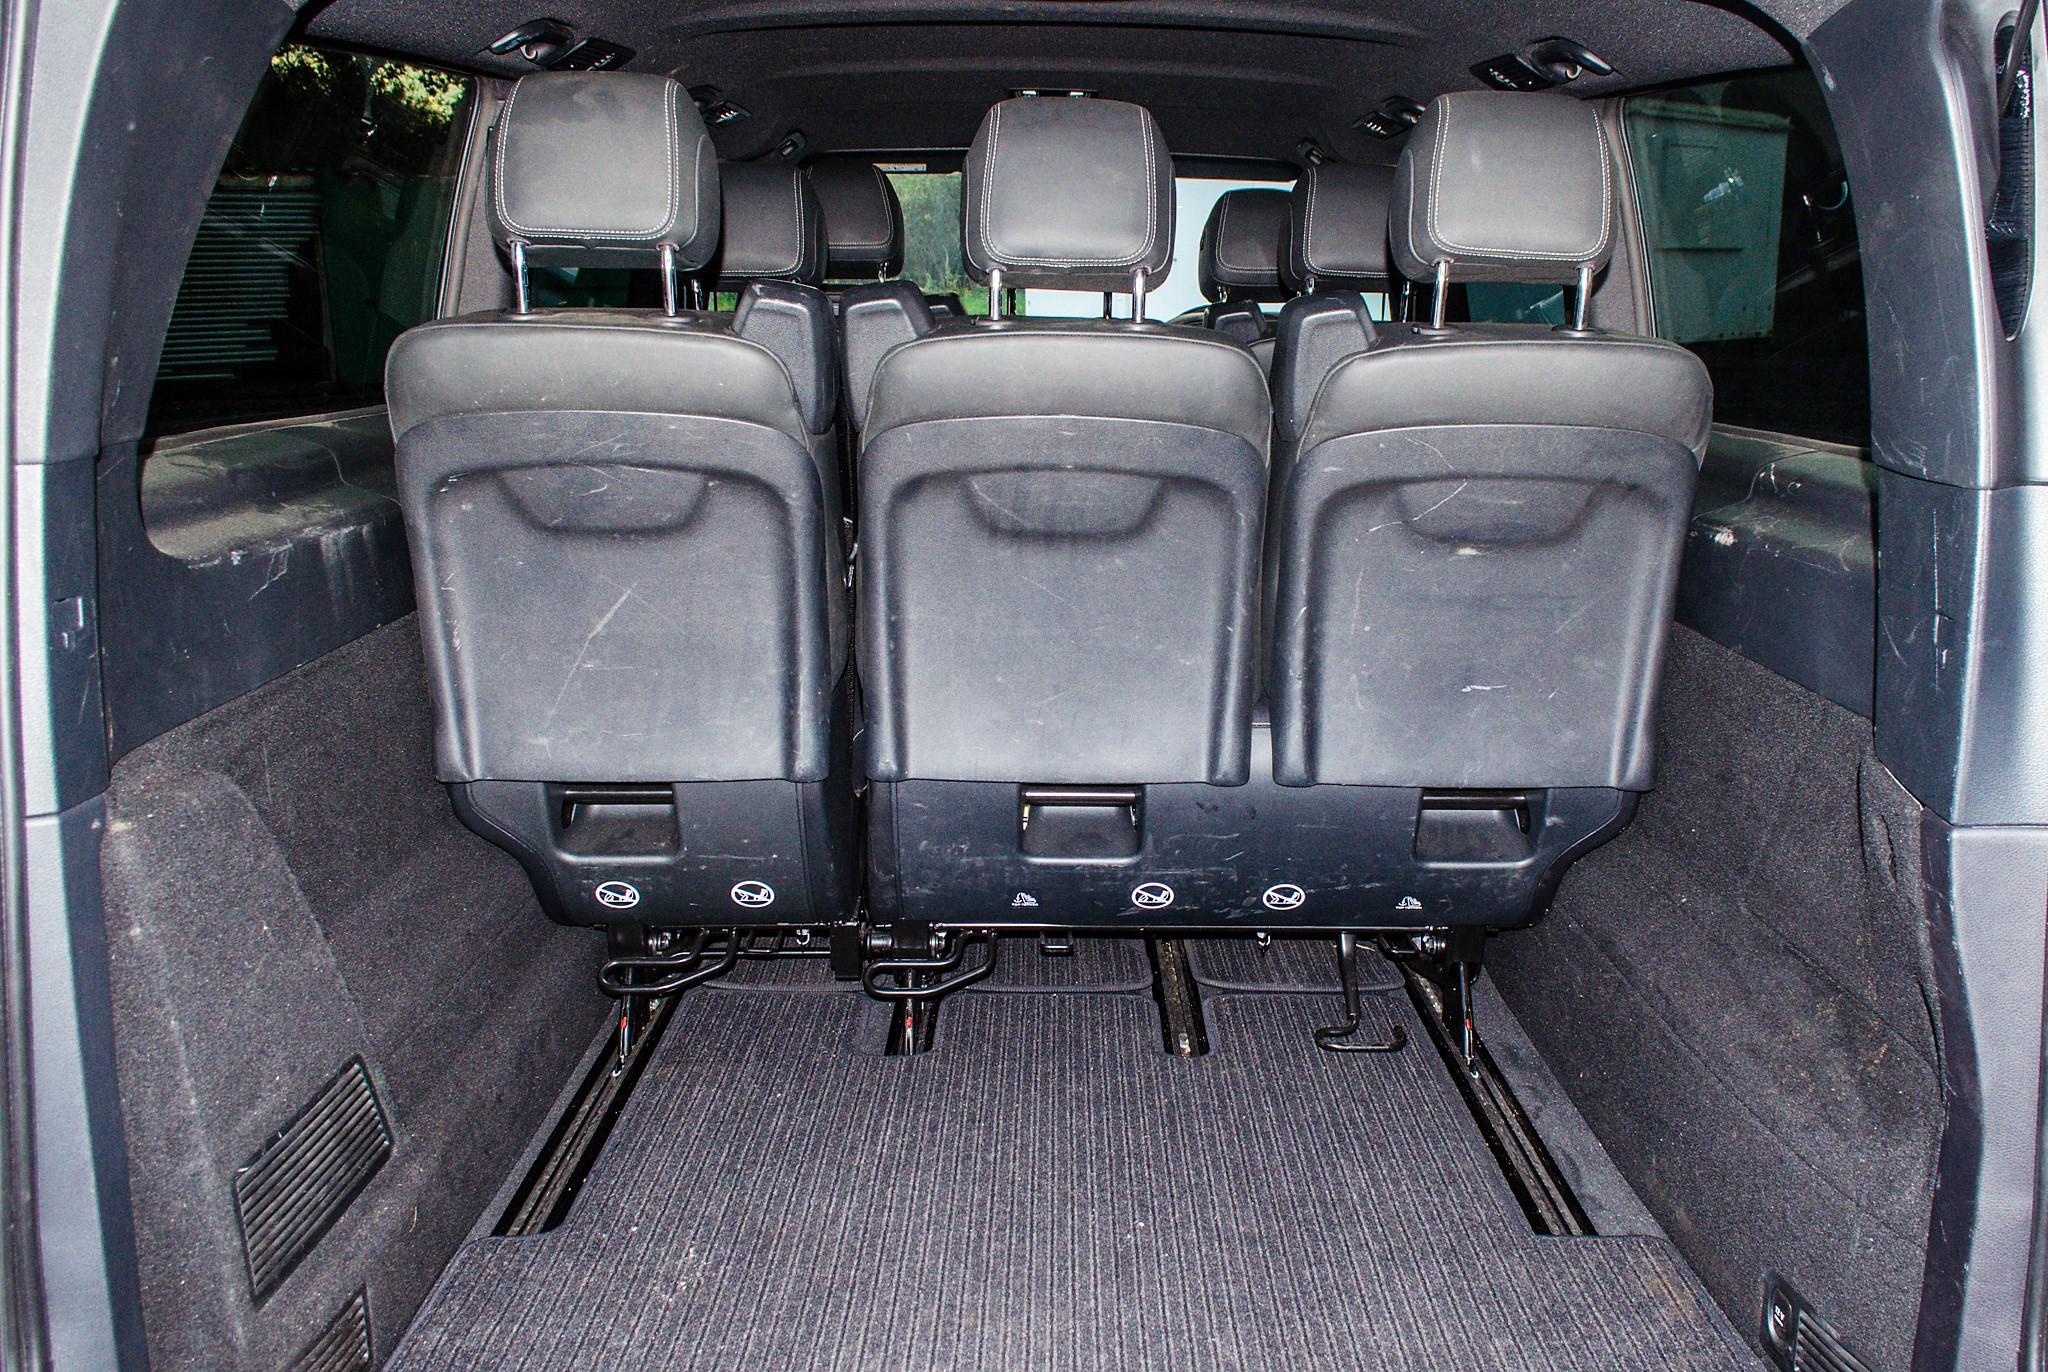 Mercedes Benz V250 Sport Bluetec XLWB auto diesel 8 seat MPV Reg No: FY68 JTO Date of First - Image 22 of 27